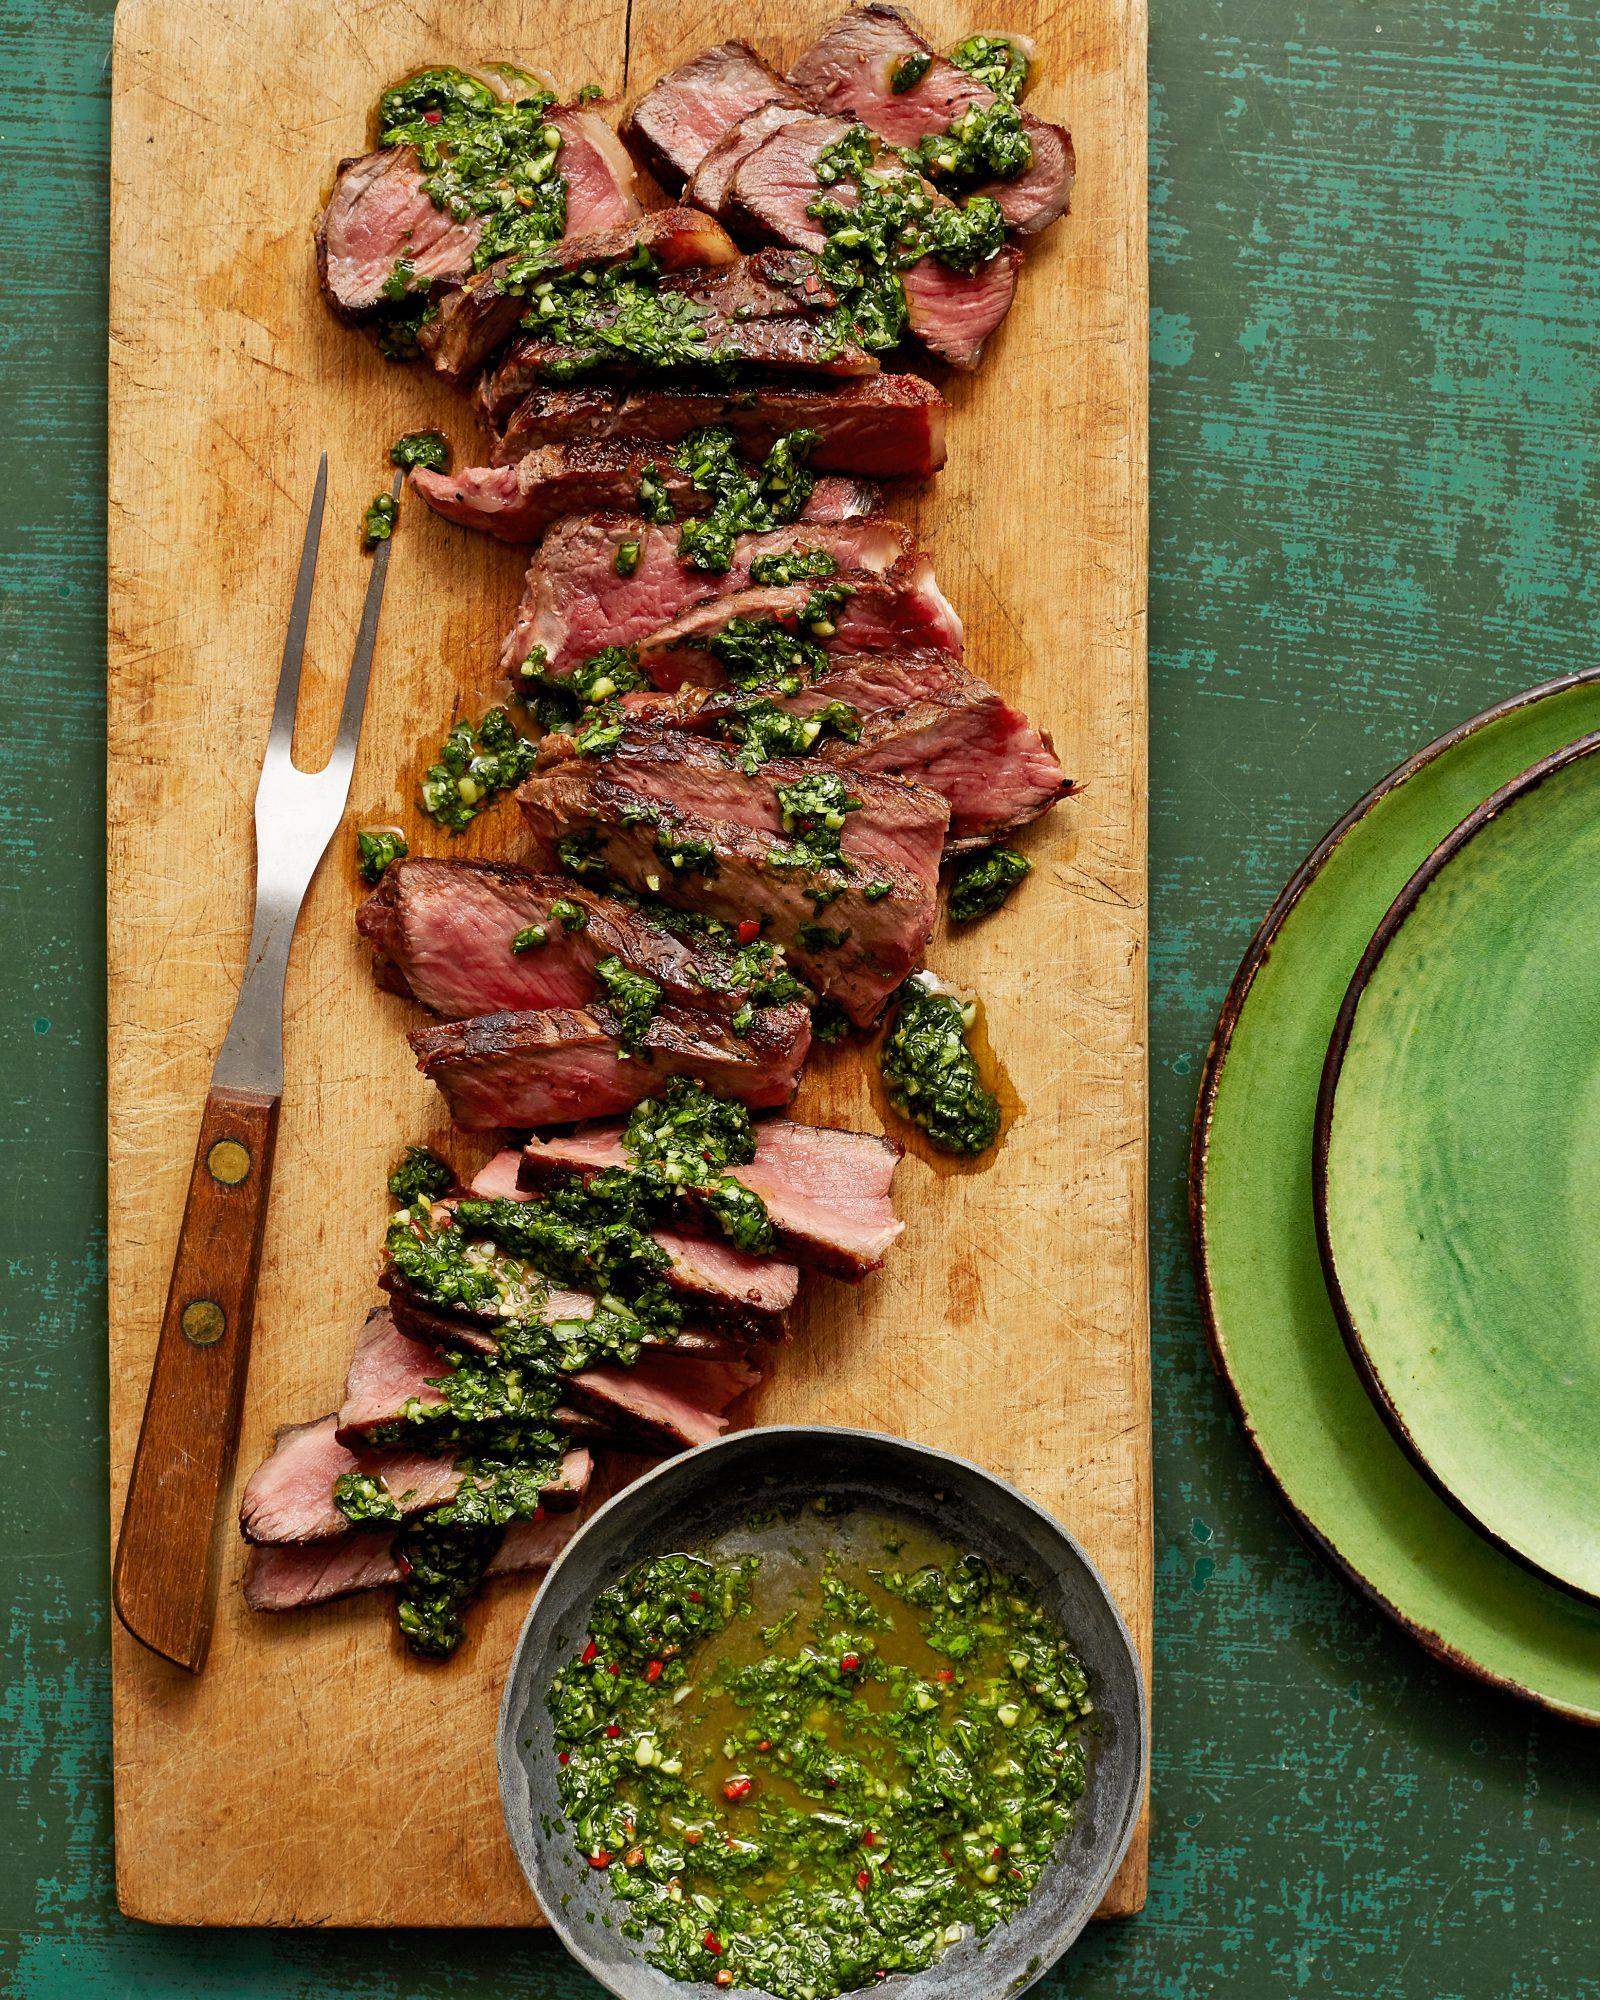 Grilled Steak & Cilantro Chimichurri